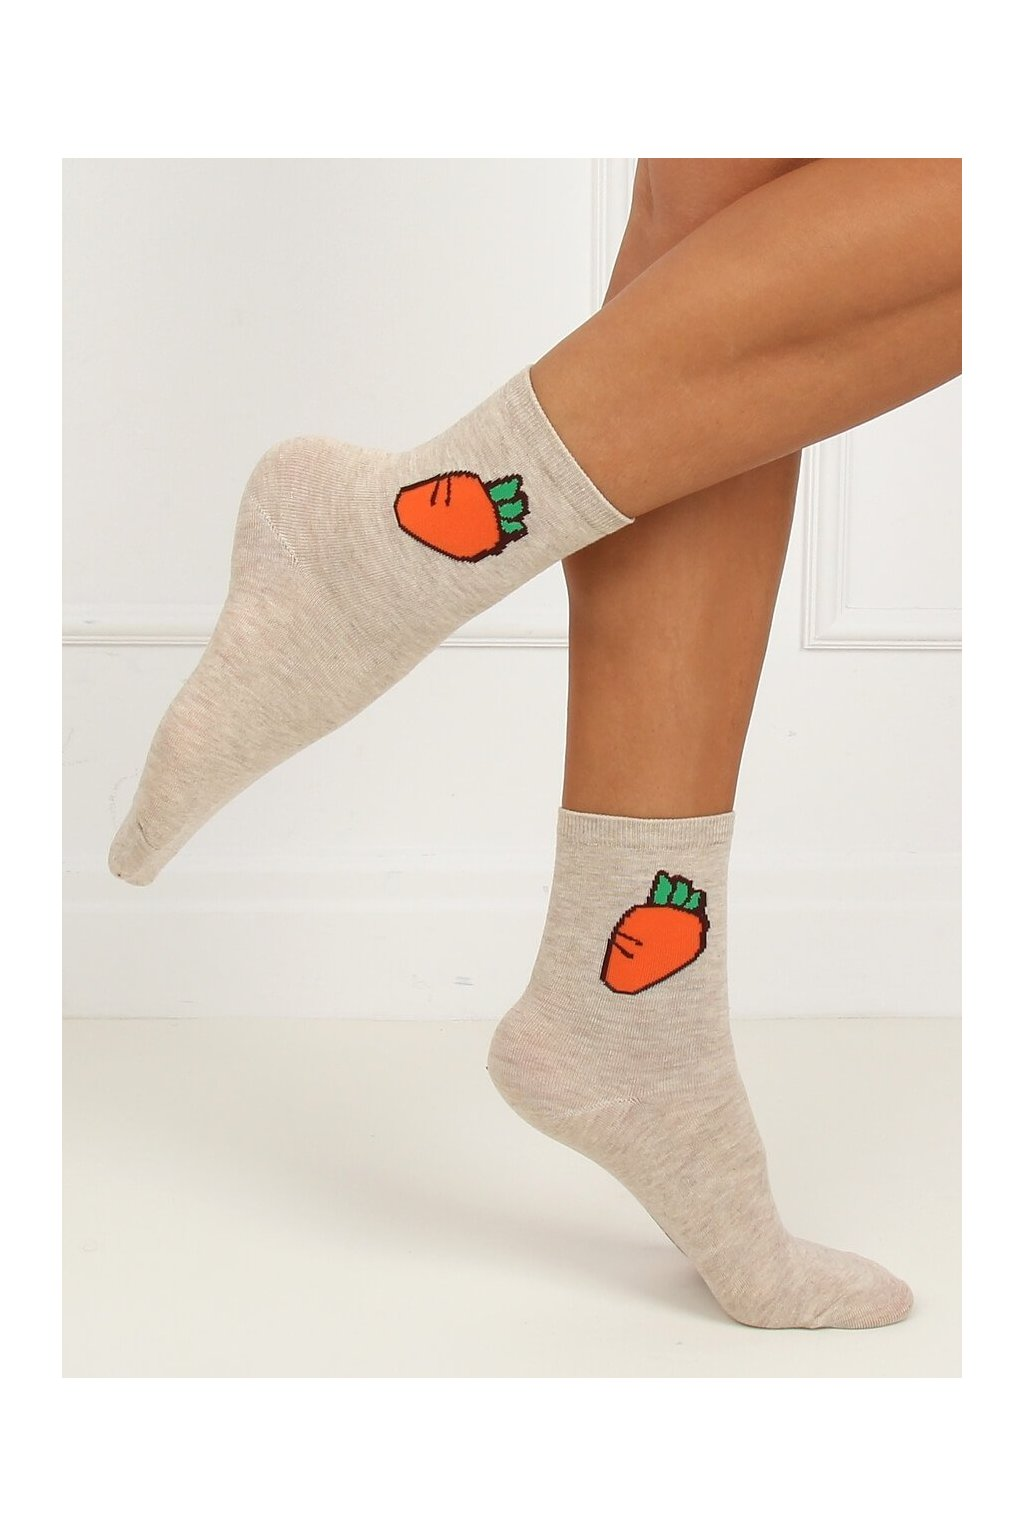 Damske ponožky hnedé SK-NZP6371